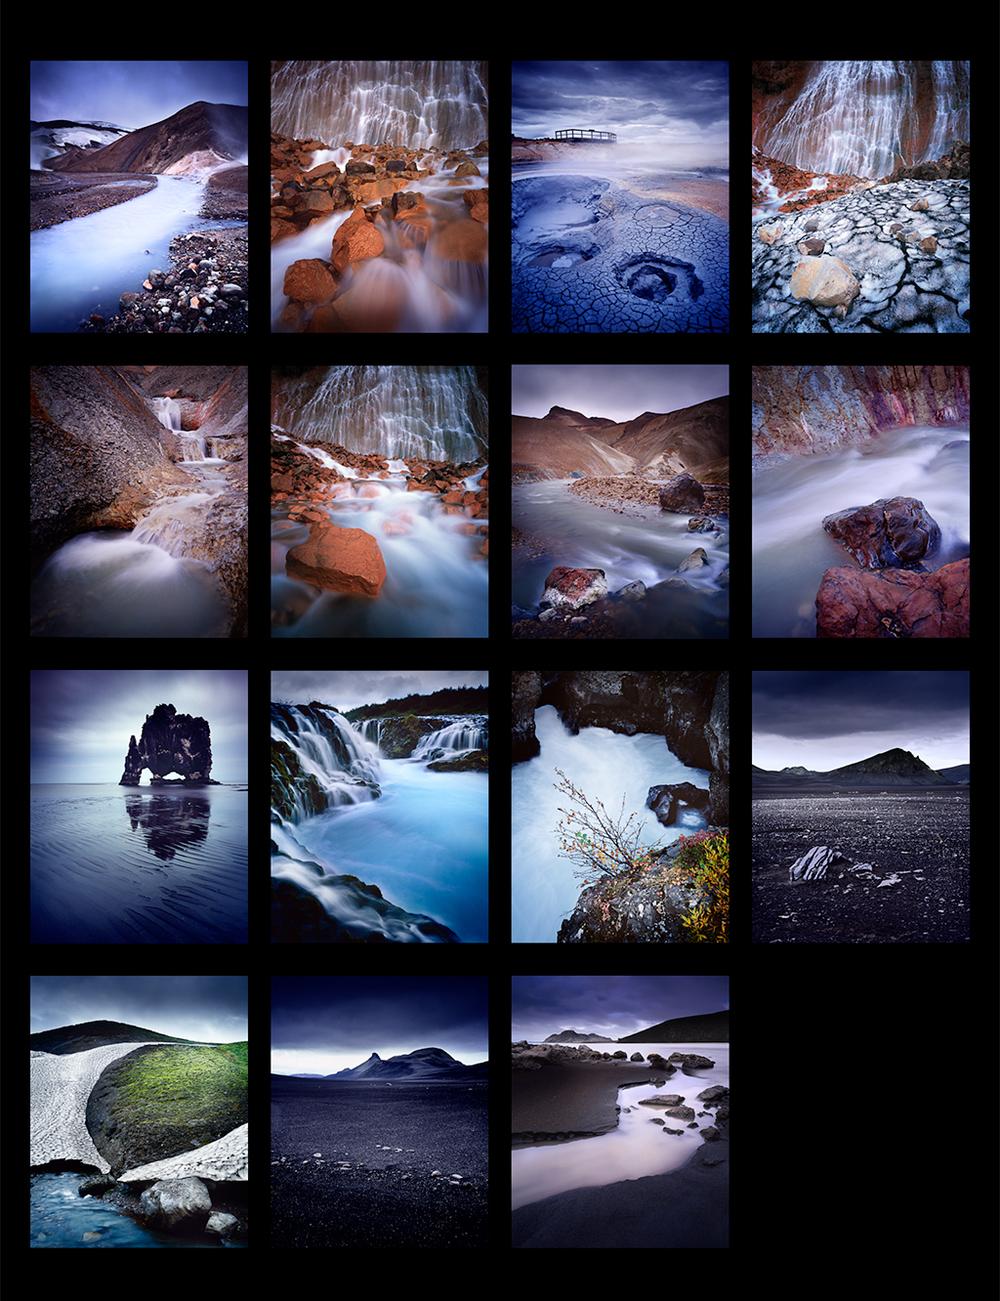 Images © Bruce Percy. Mamiya 7 camera, Fuji Velvia RVP 50 film.